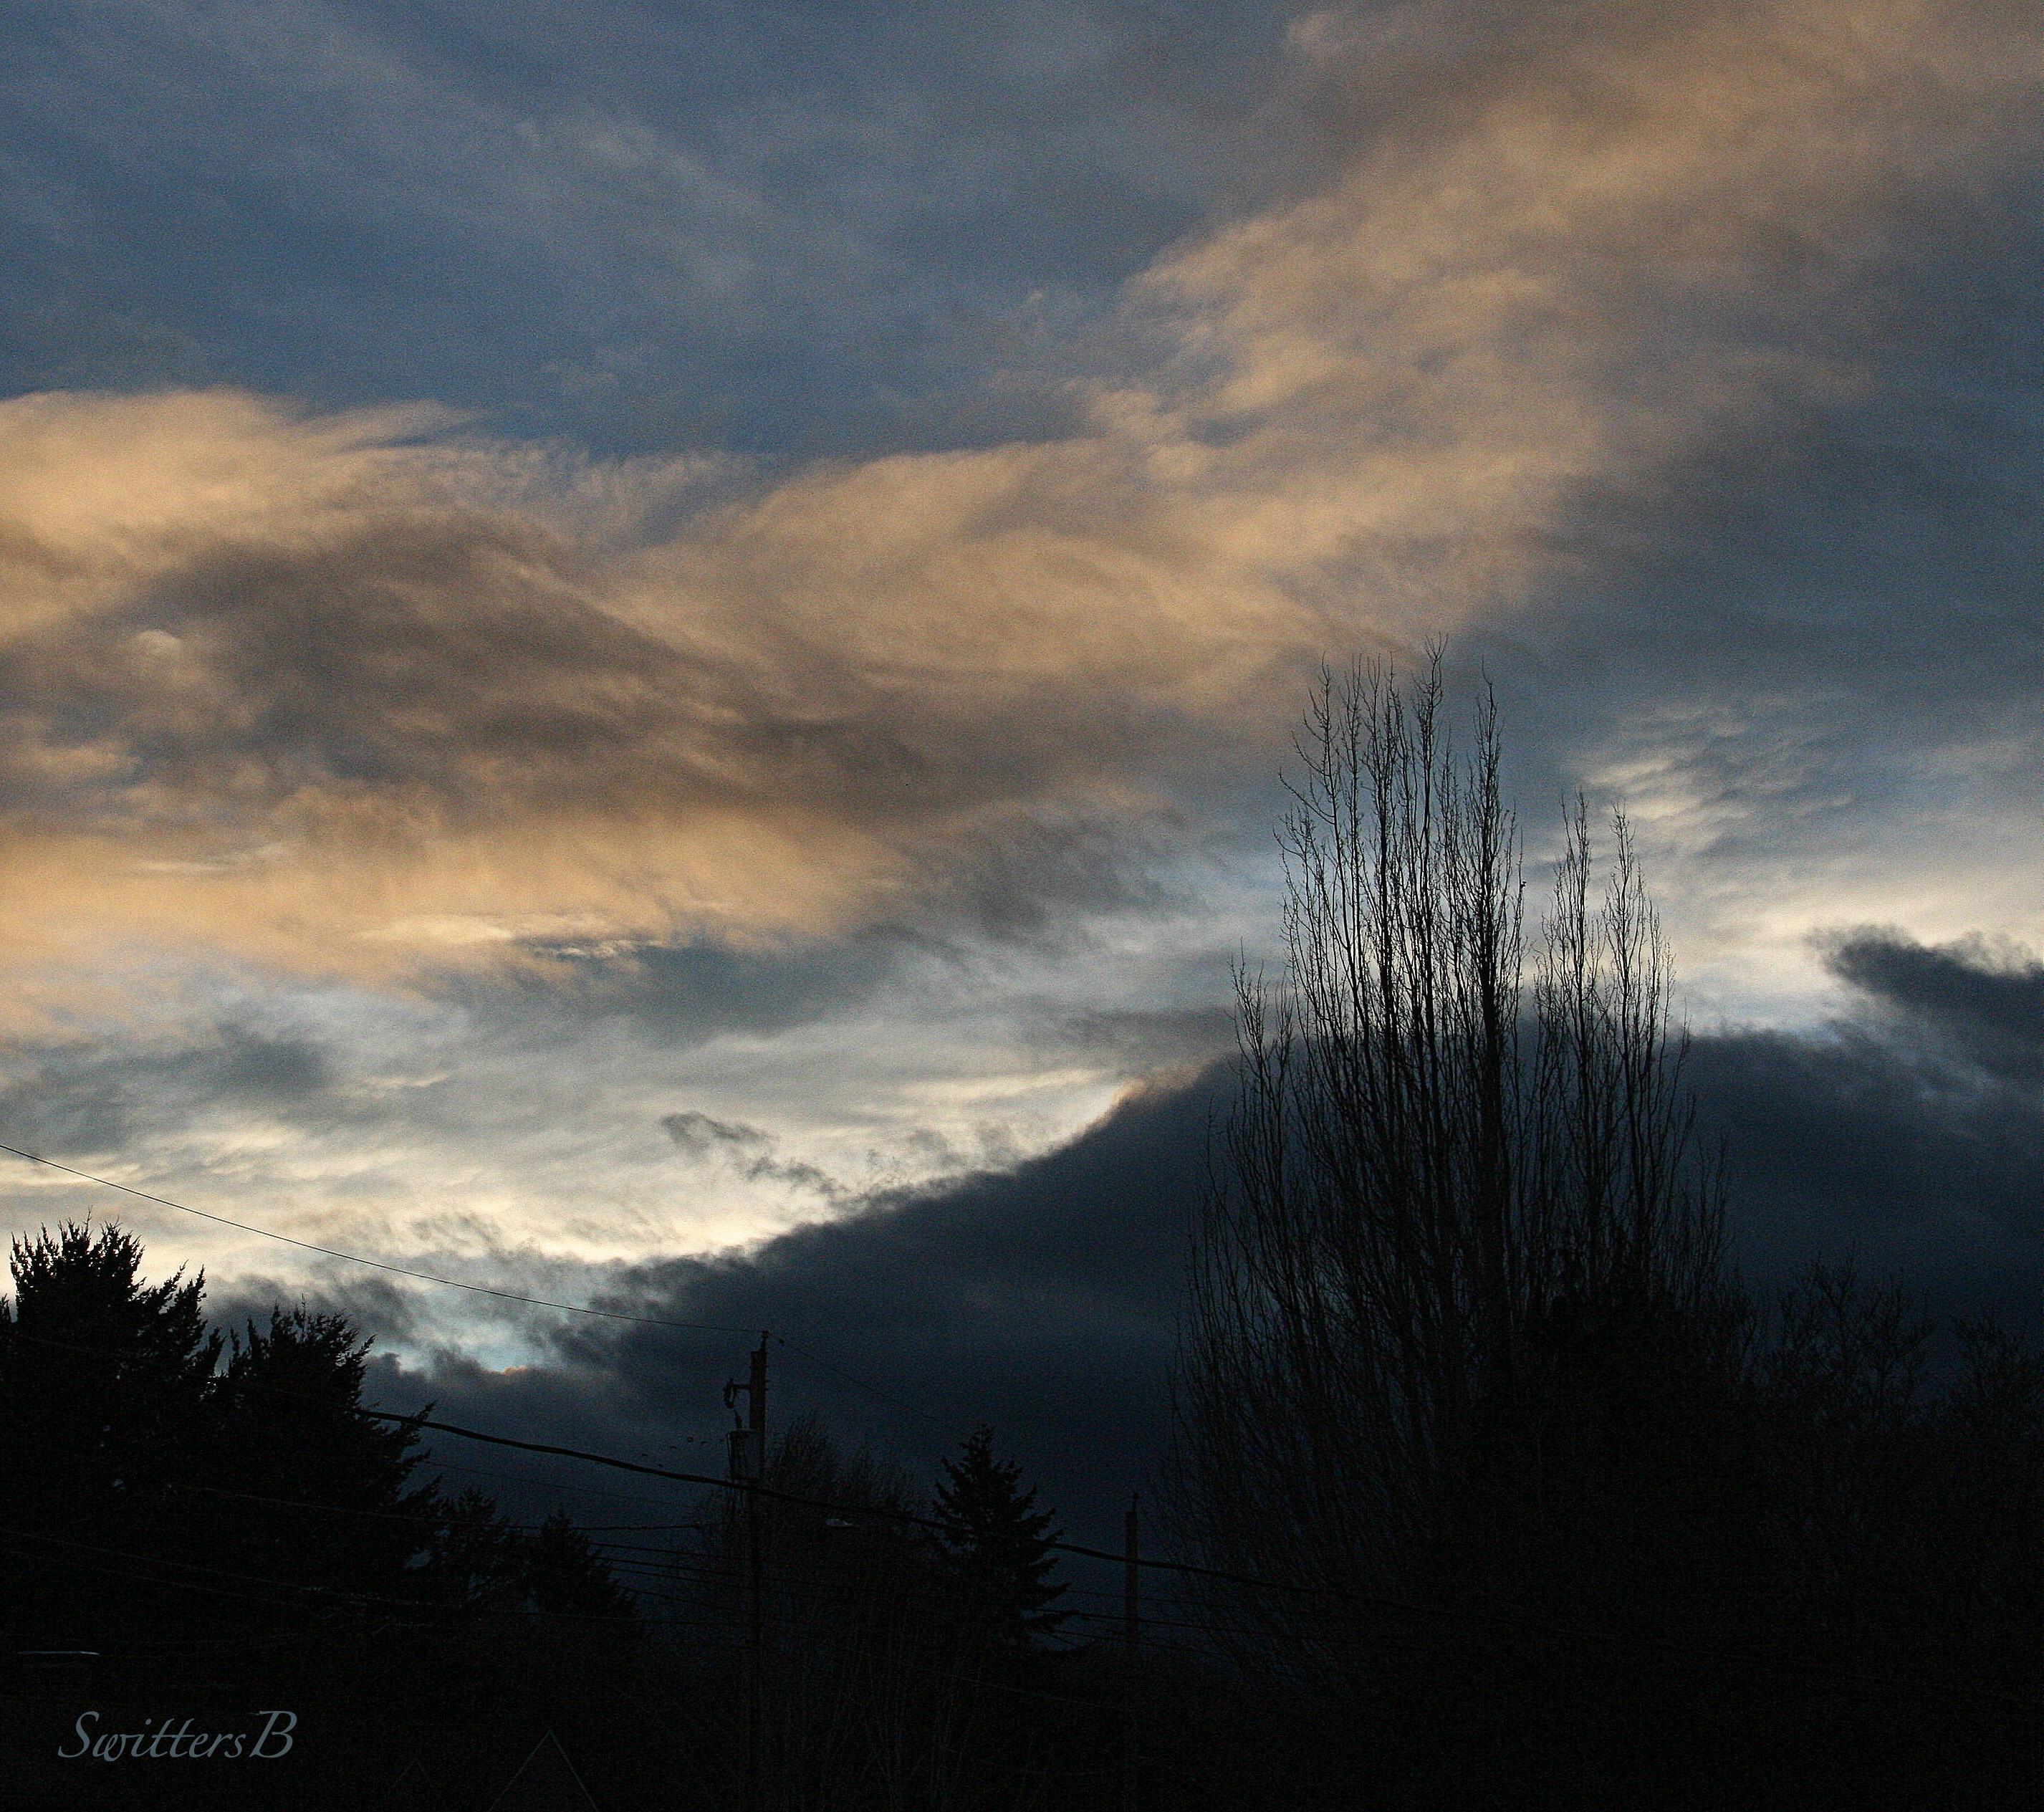 sky-transition-weather-Portland-SwittersB